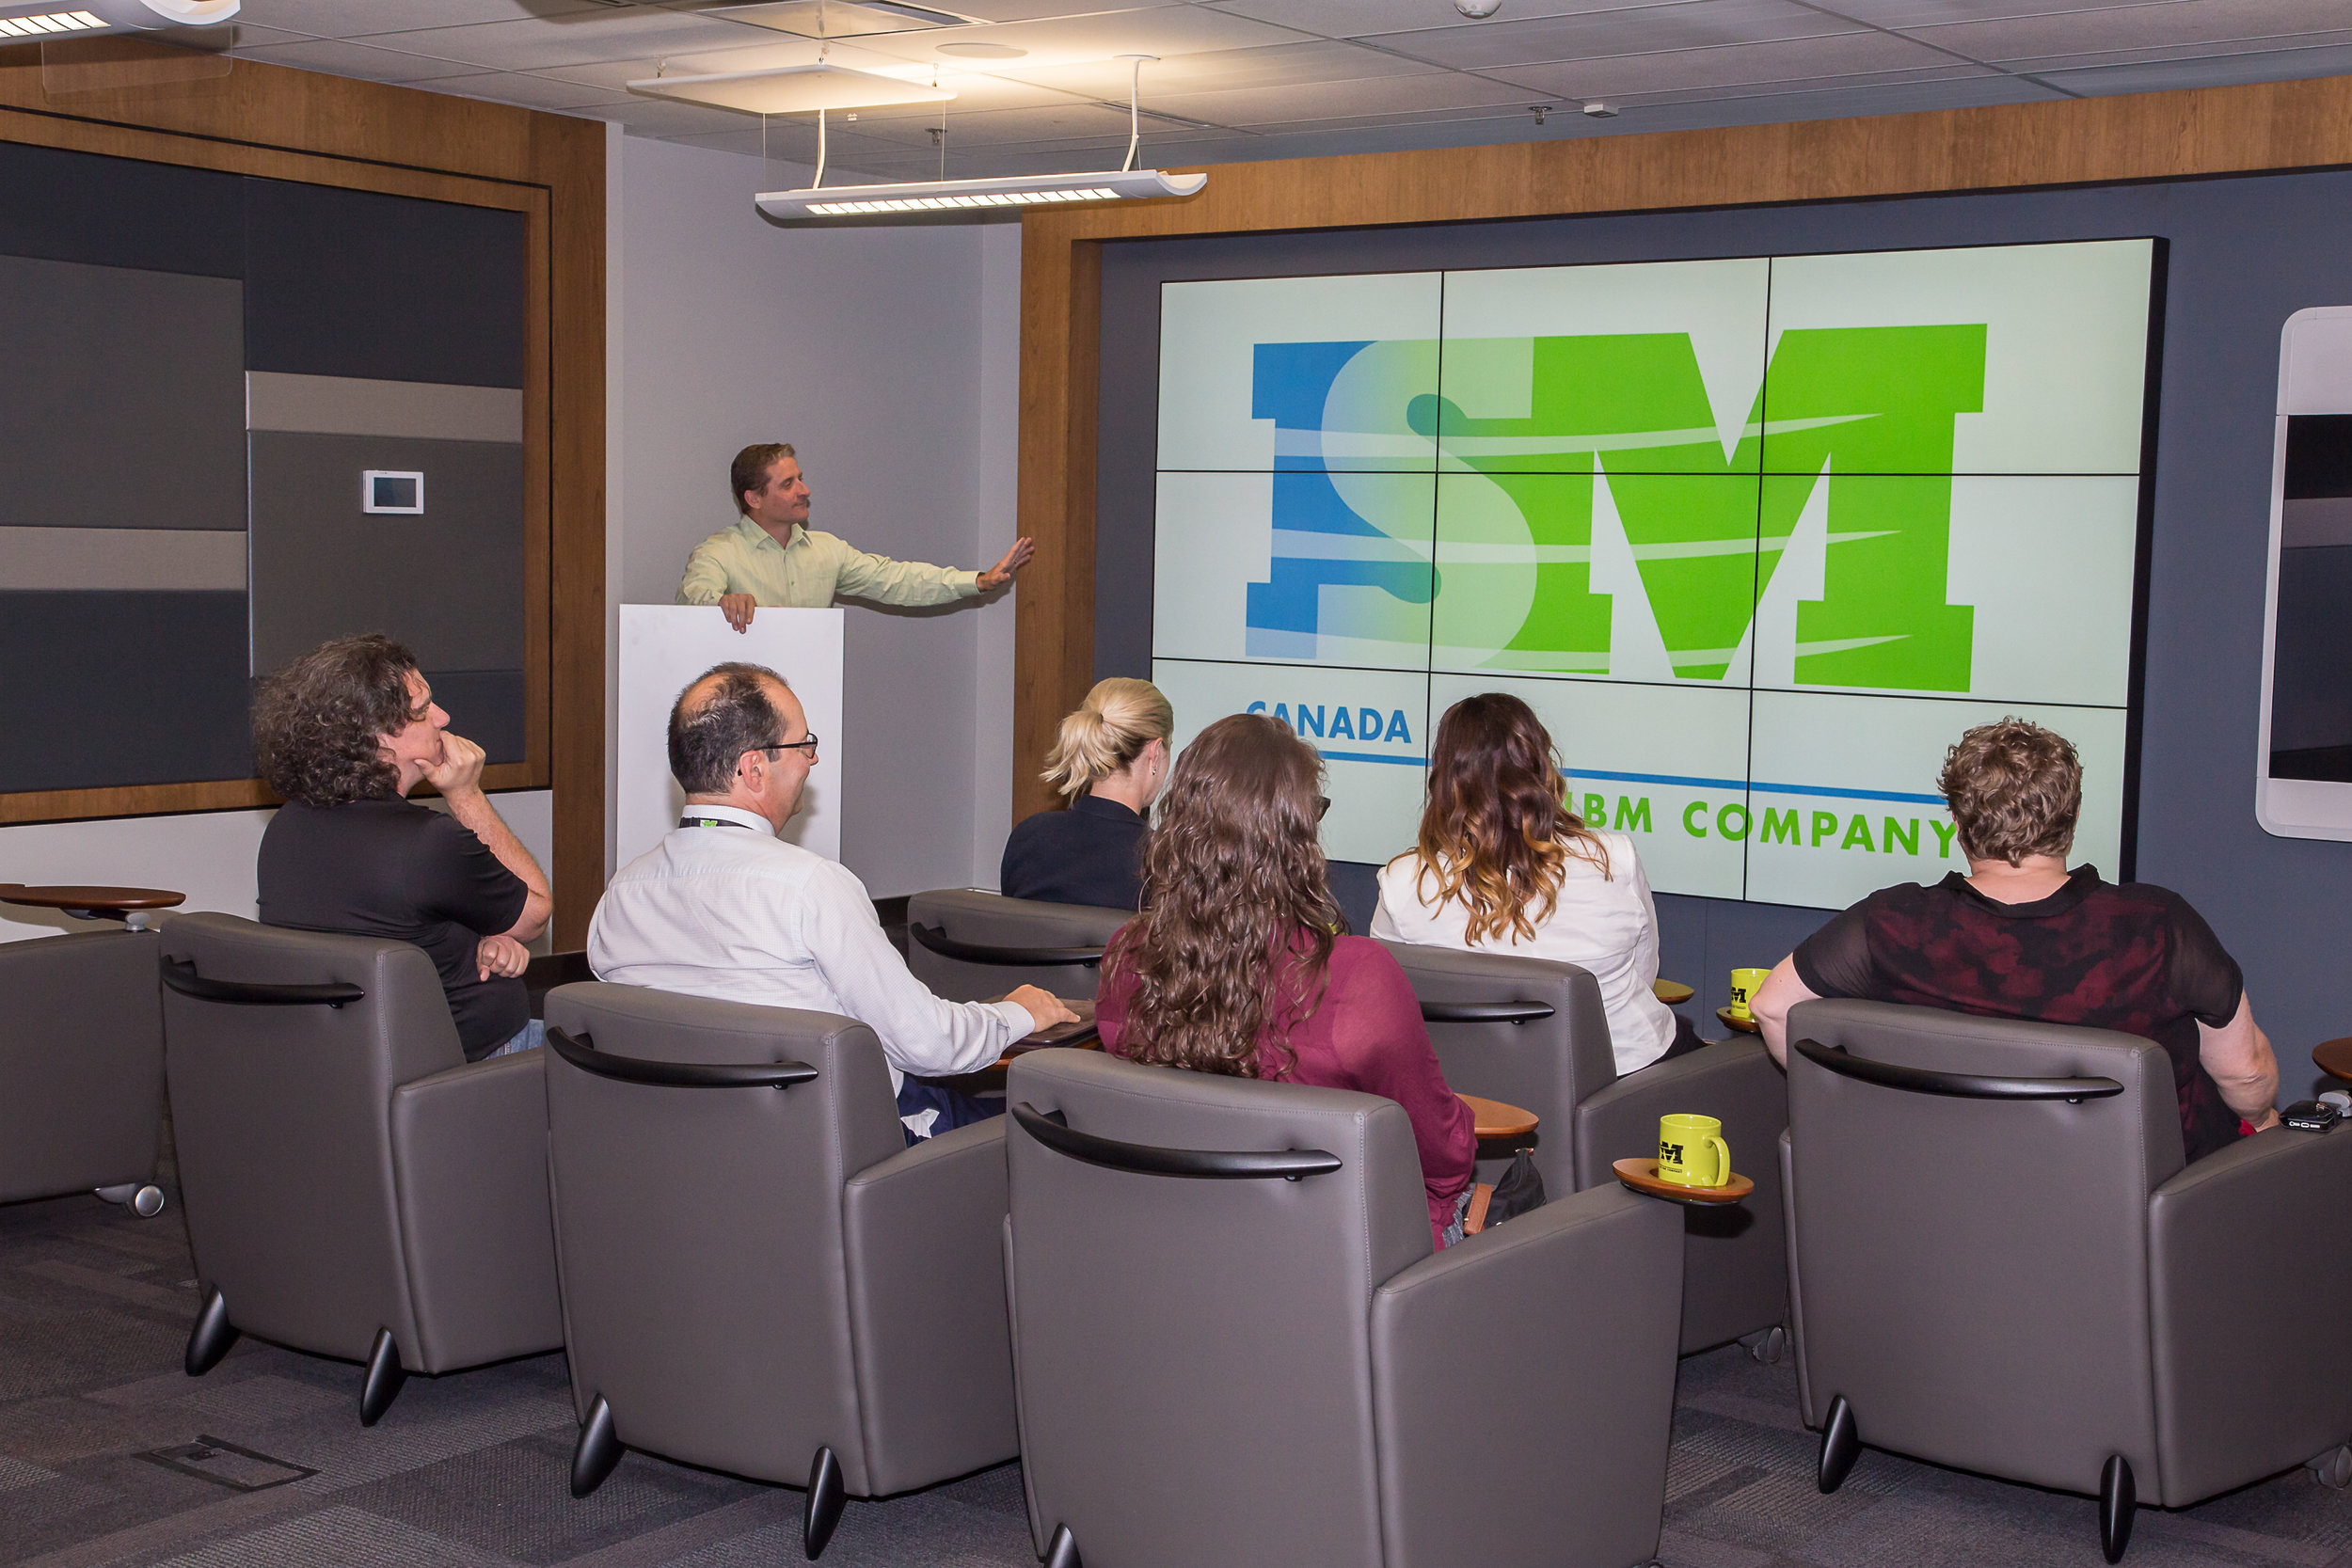 Executive Briefing Room, 9 screen array